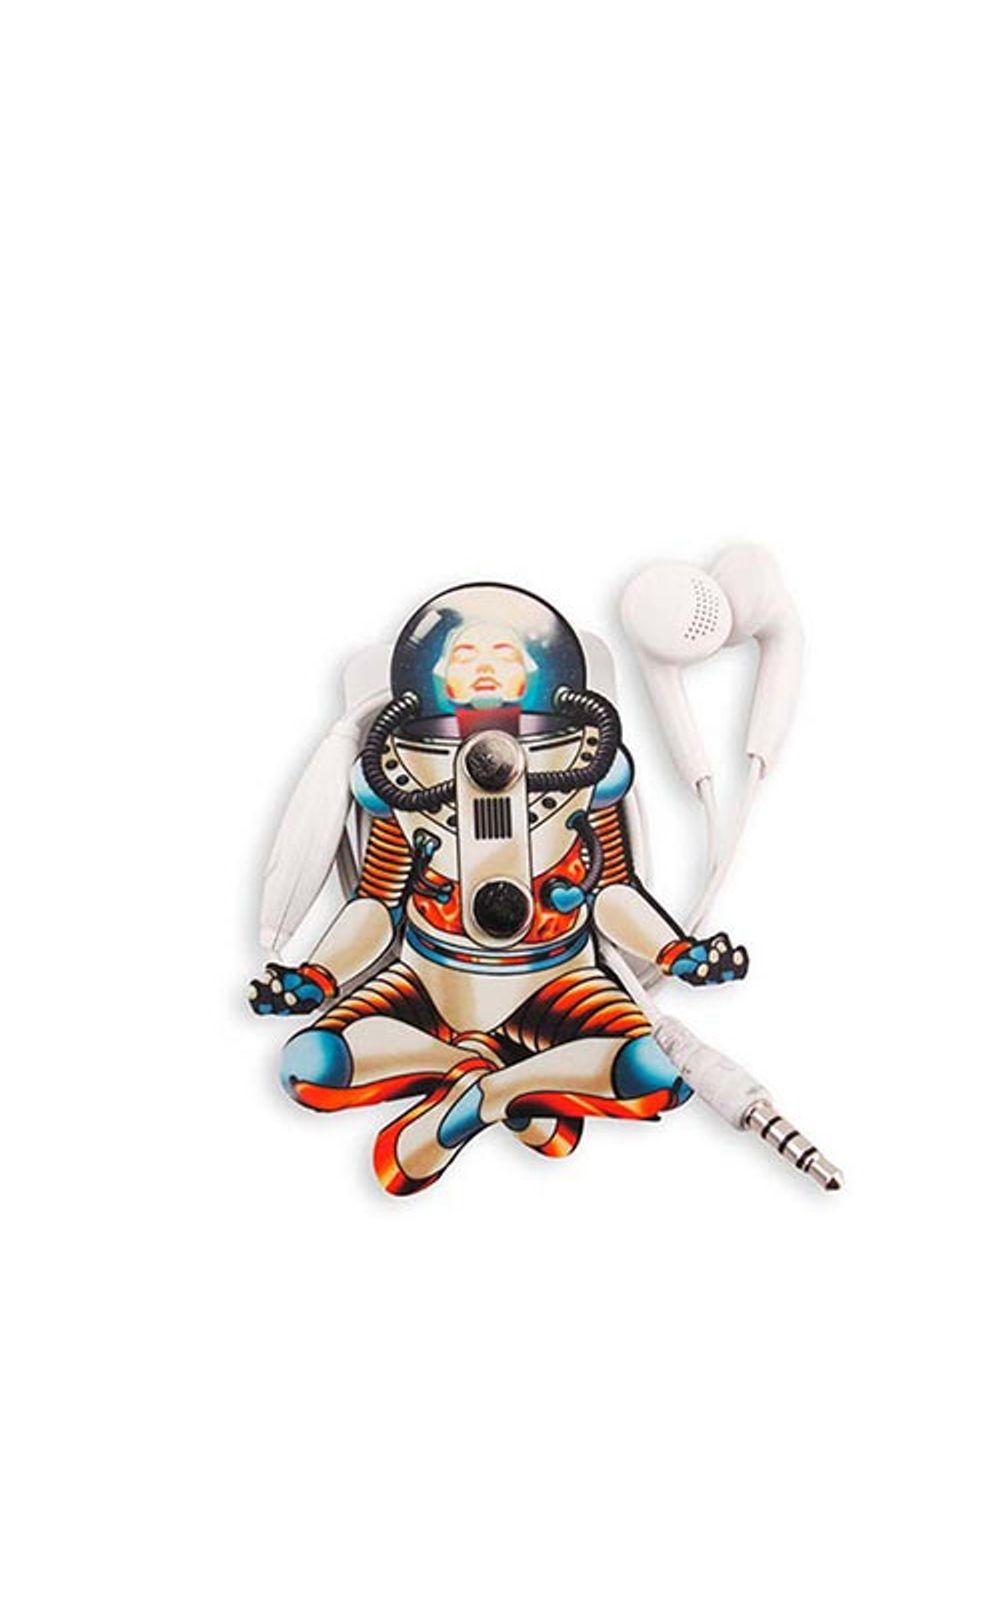 Foto 2 - Organizador de Fio Astronauta